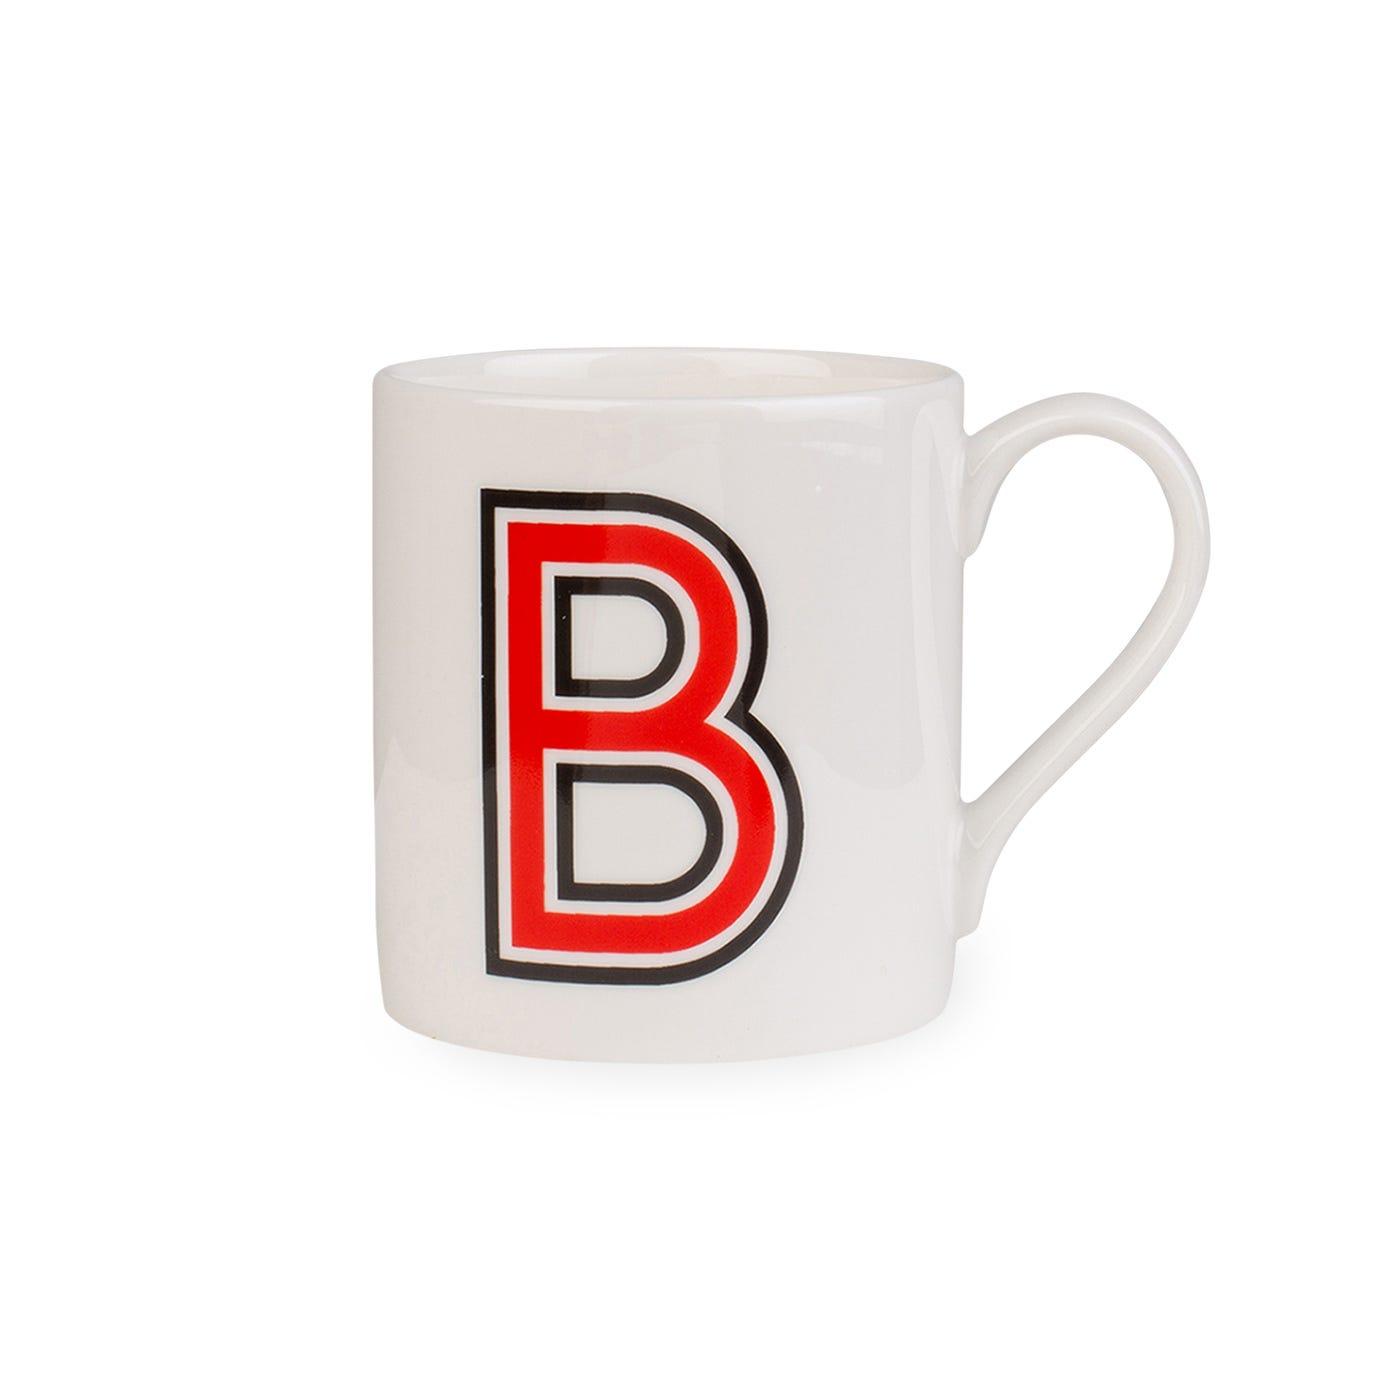 Heal's Heritage Alphabet Mug B